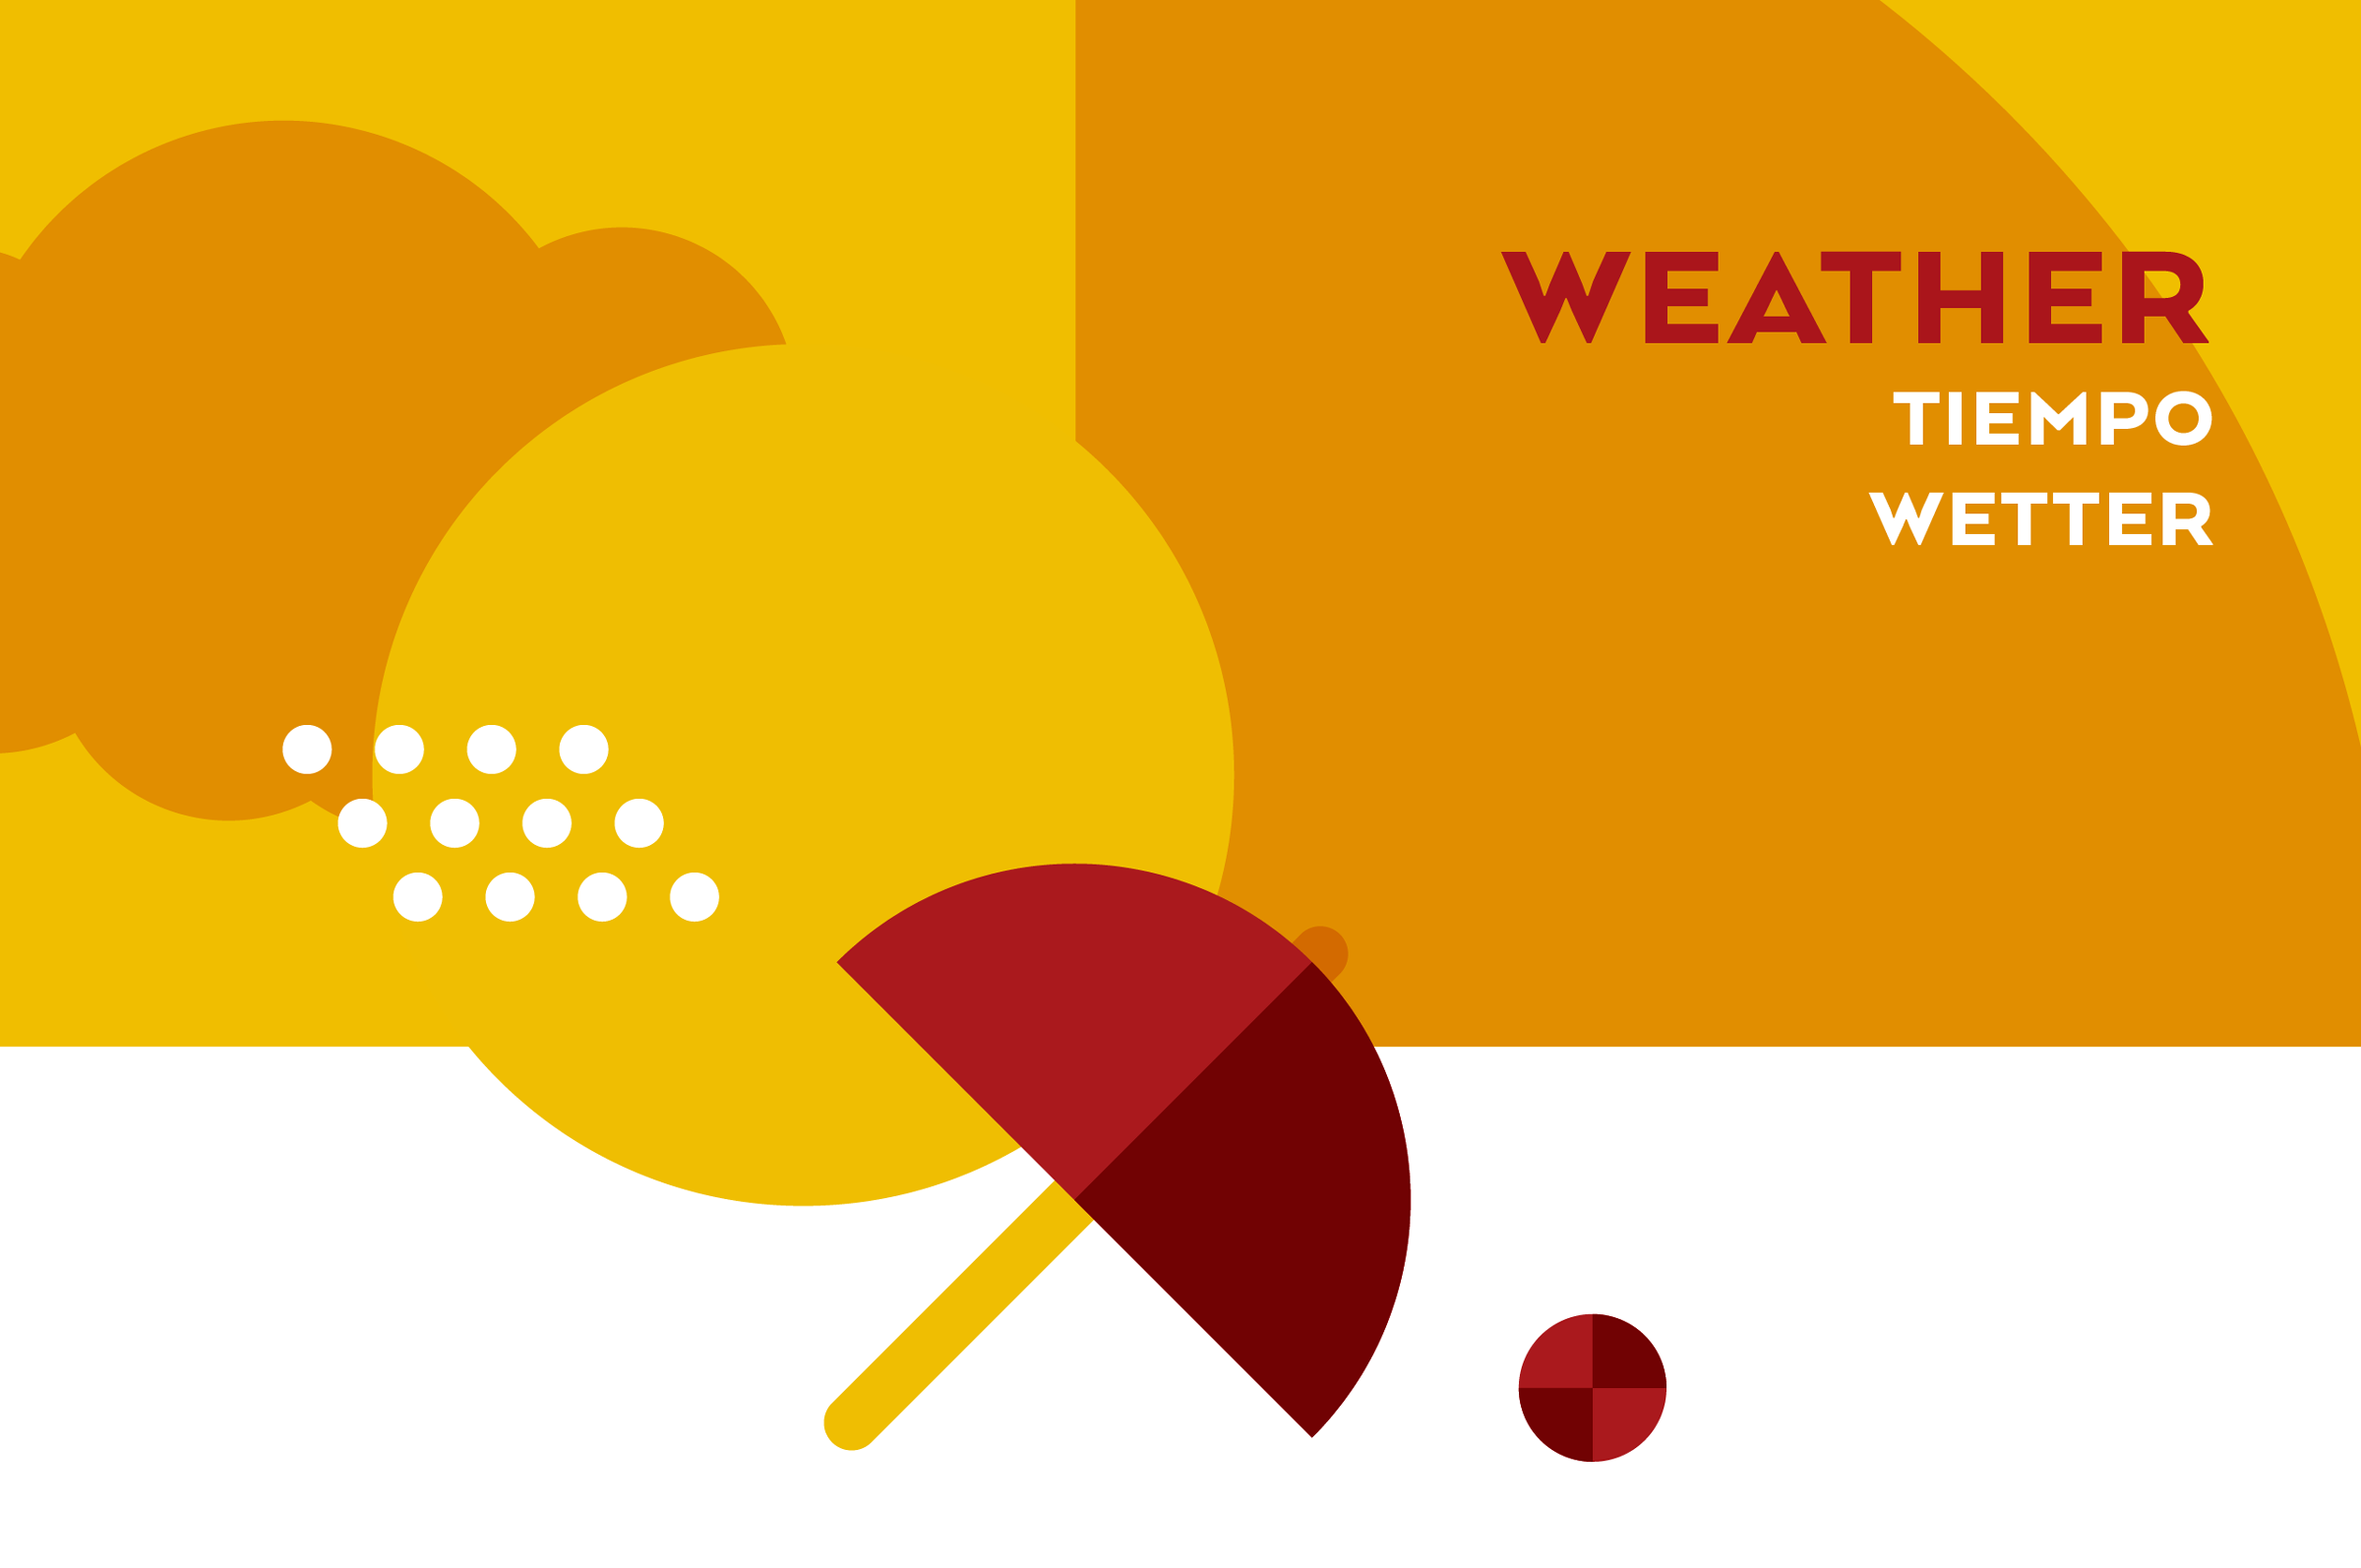 ocio7-illustration-weather-buero-ink-graphic